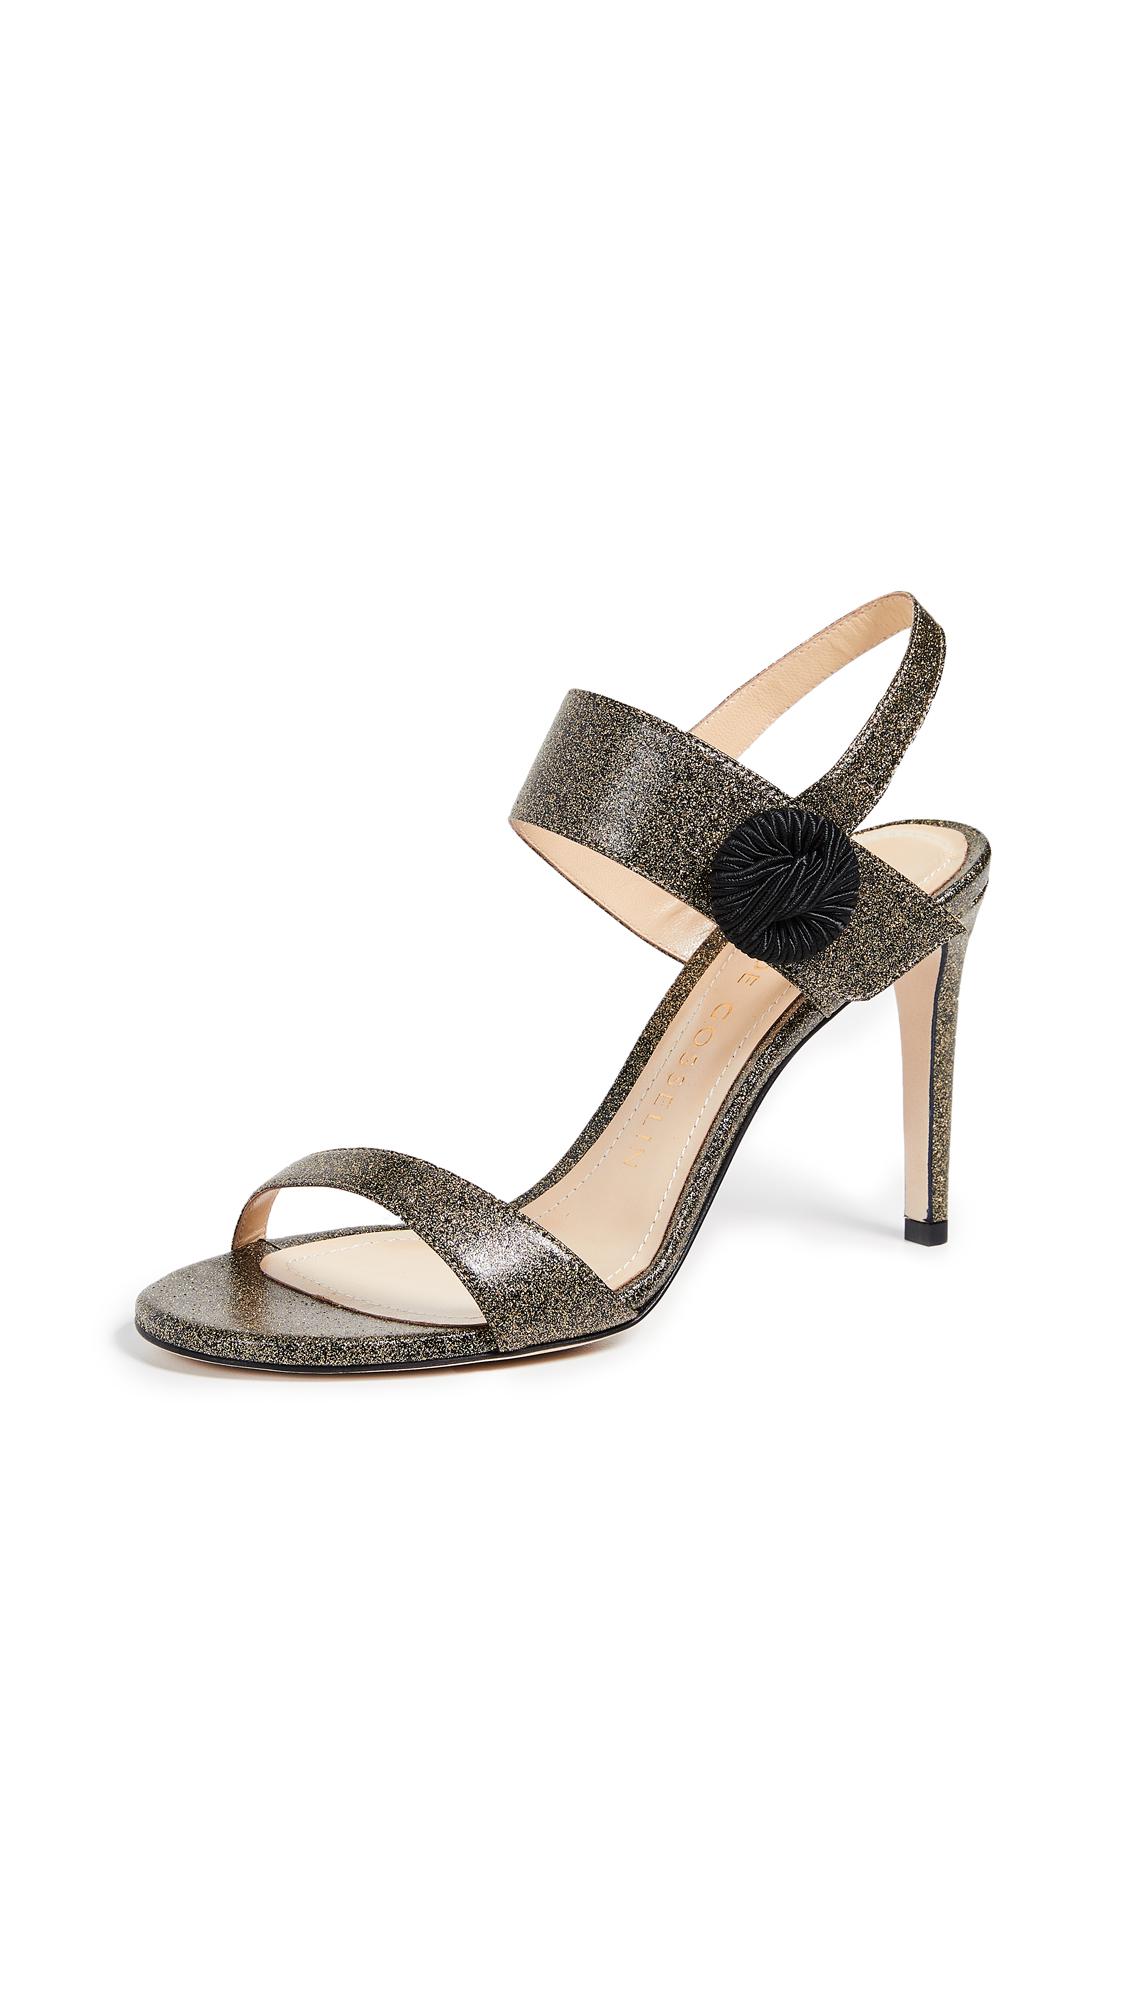 Chloe Gosselin Tori 90 Sandals - Gold